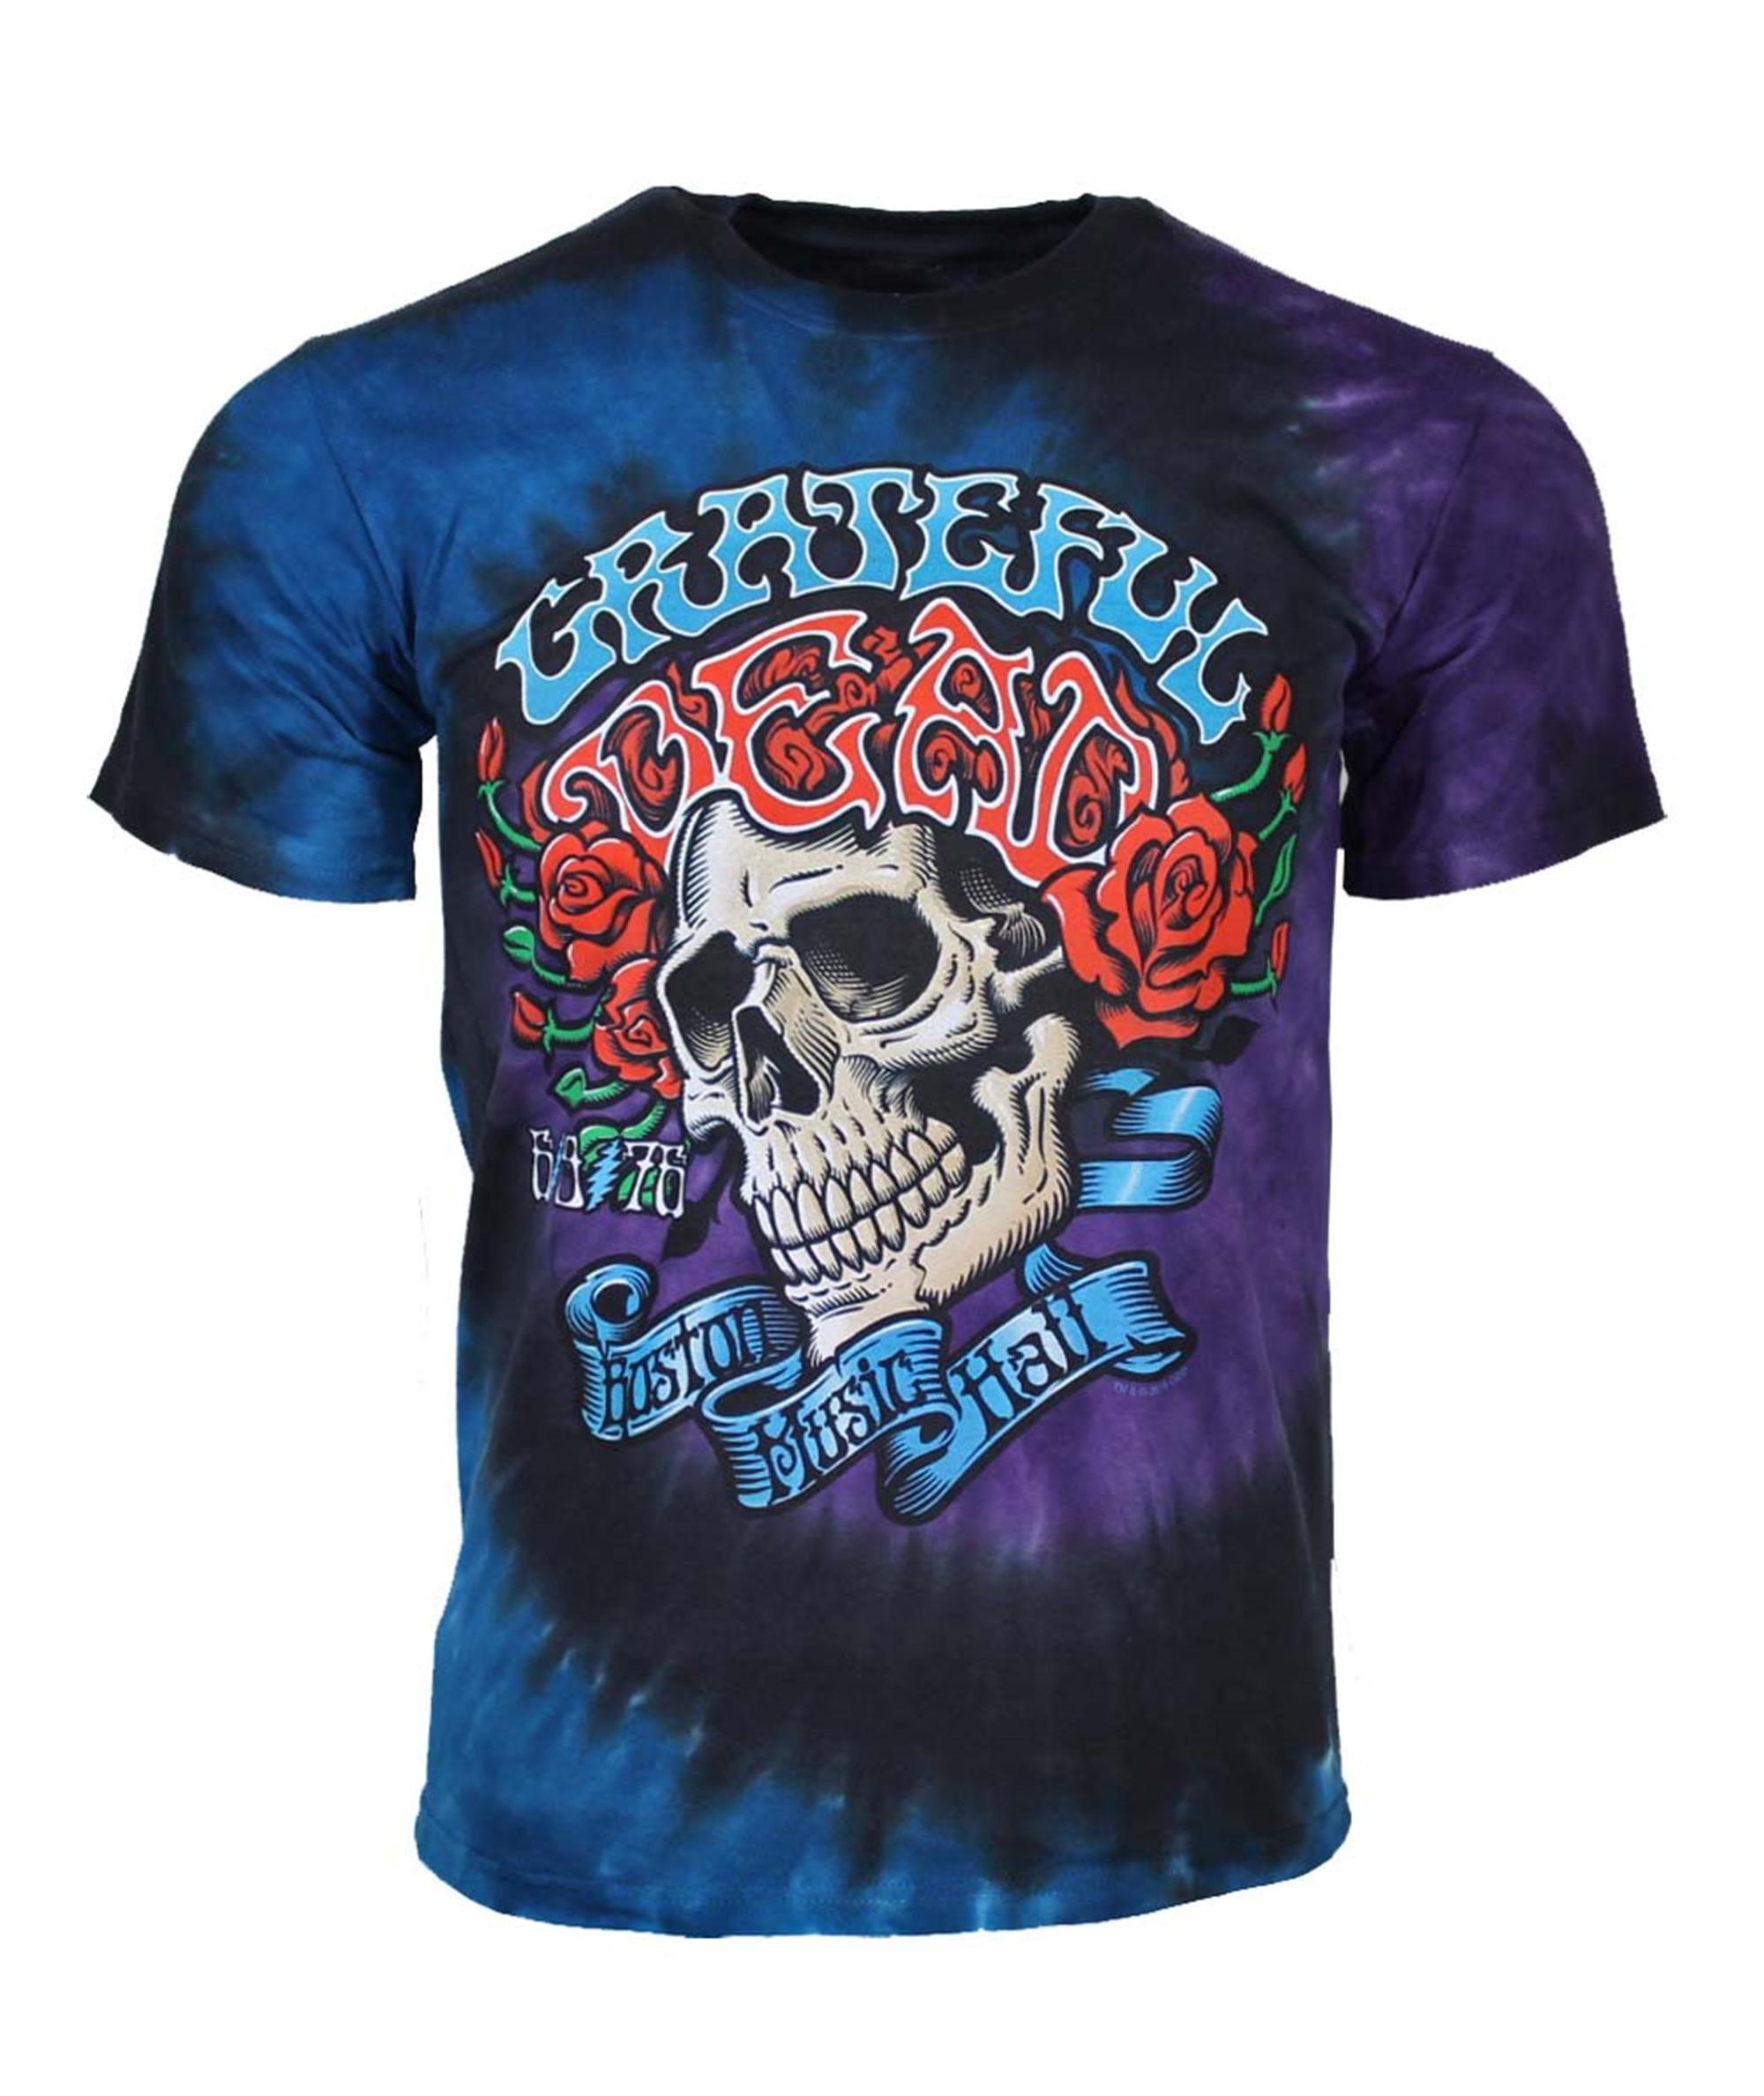 Grateful Dead Boston Music Hall T-Shirt